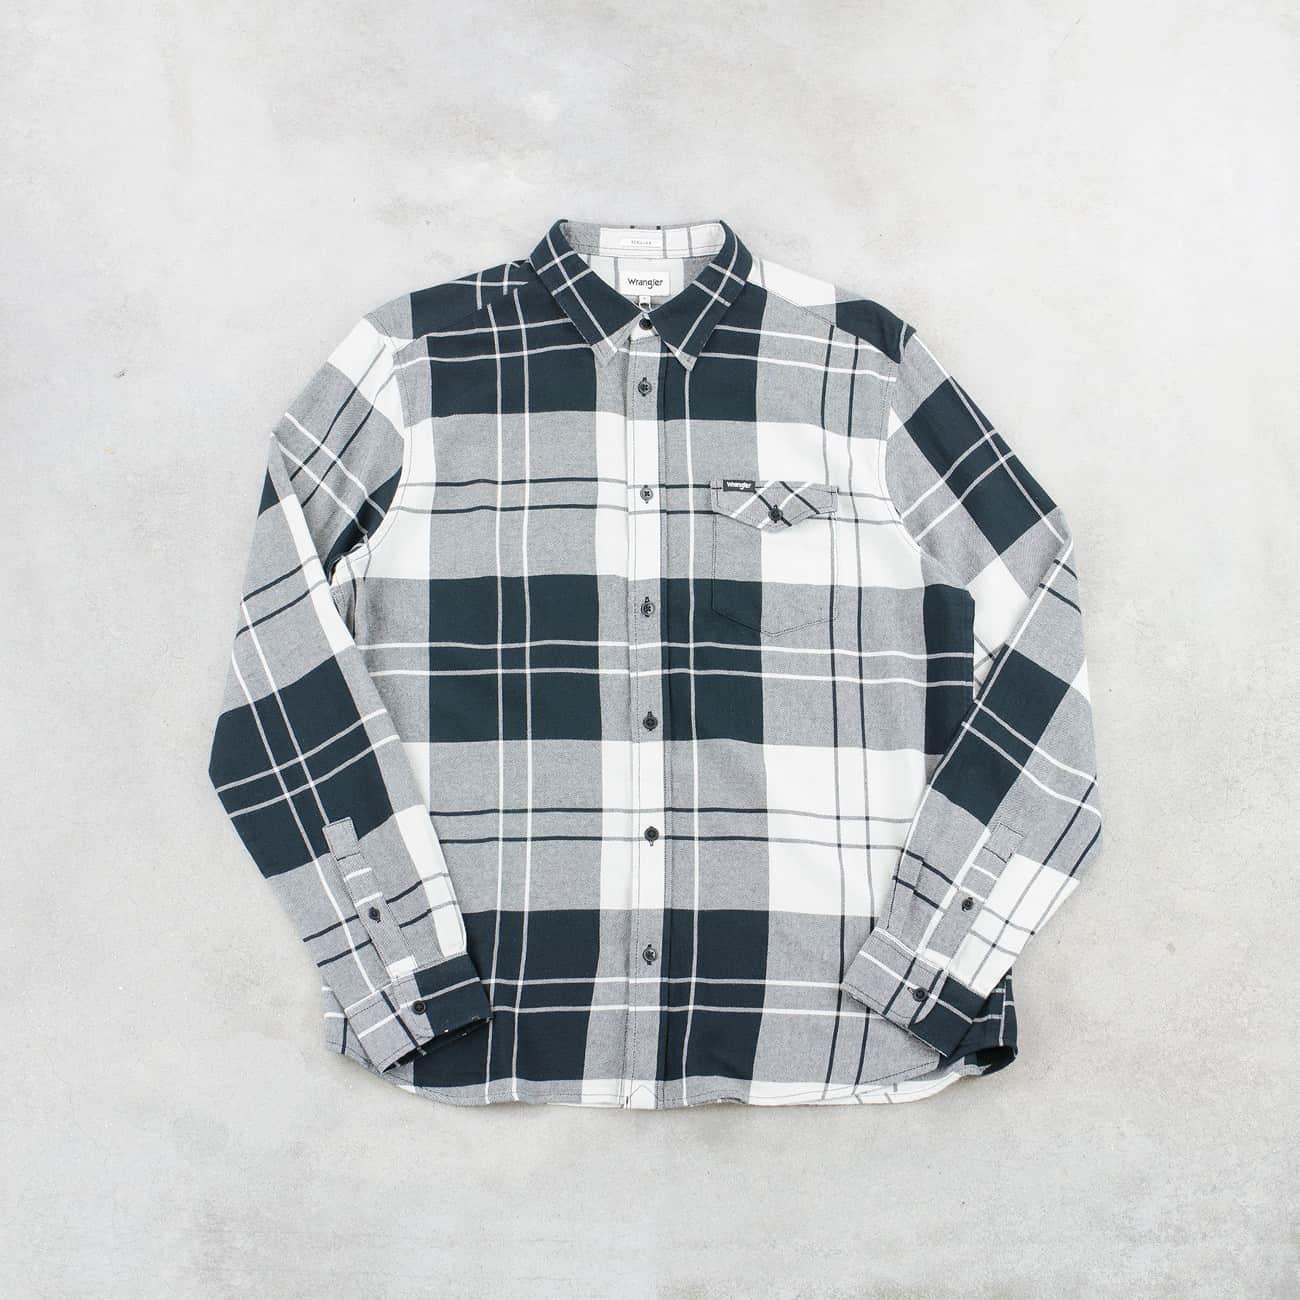 LS 1pkt flap shirt